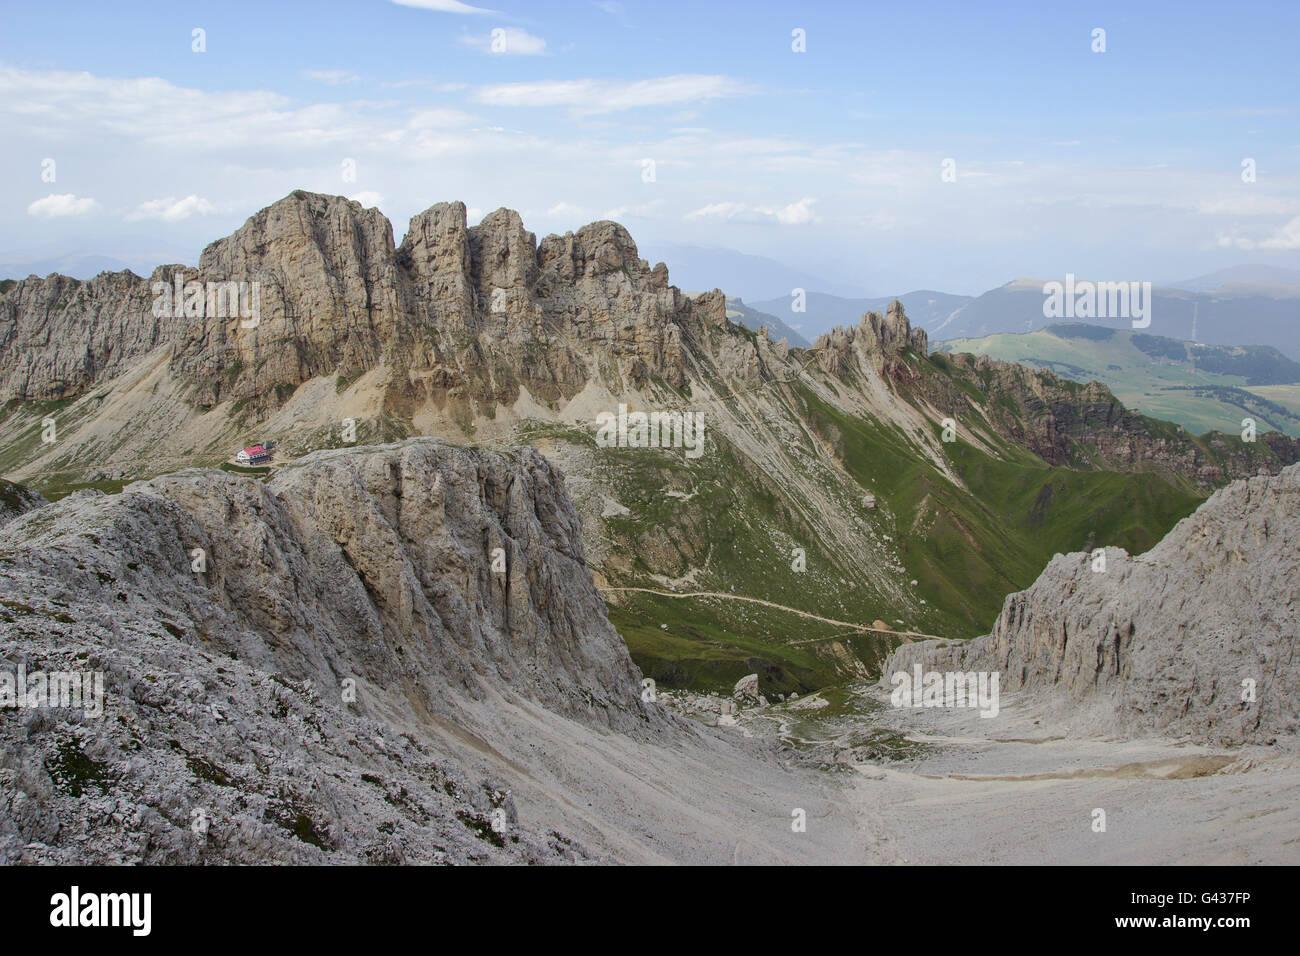 Tierser Alp and Roßzähne, Schlern Group, Dolomites, Italy - Stock Image